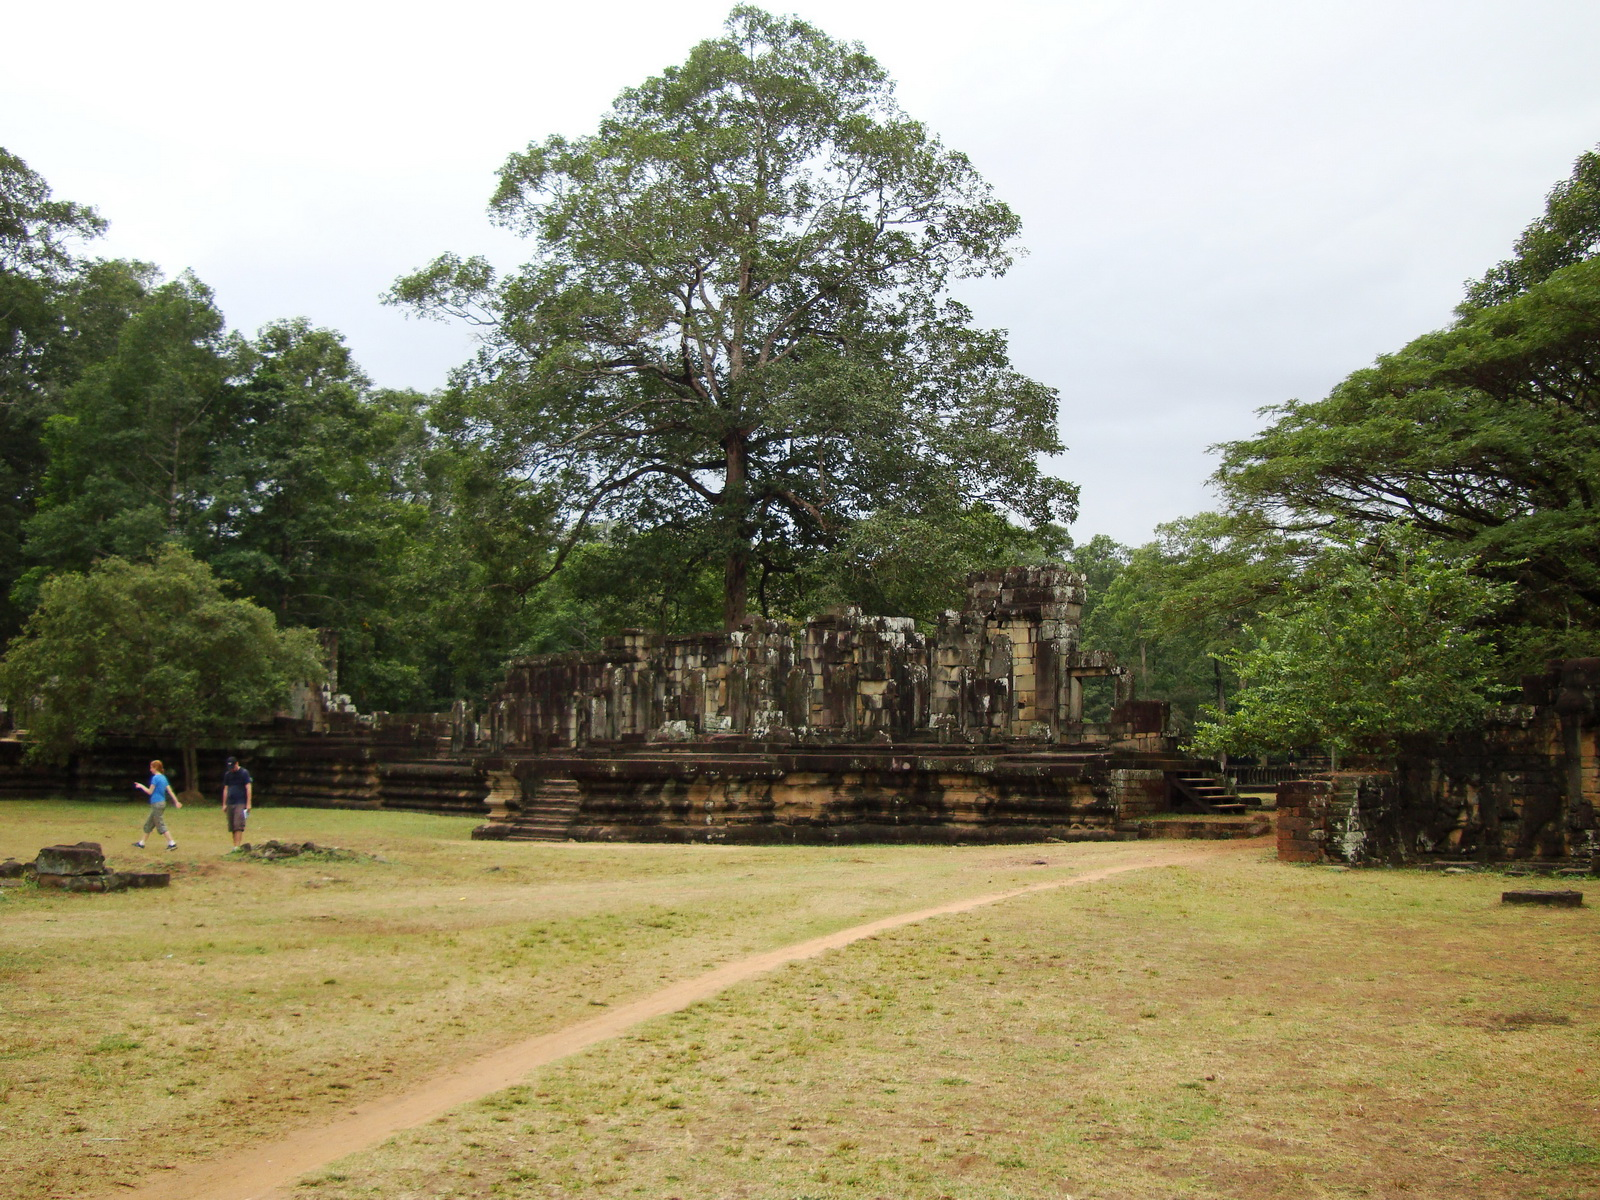 Terrace of the Elephants terrace views Angkor Thom 13